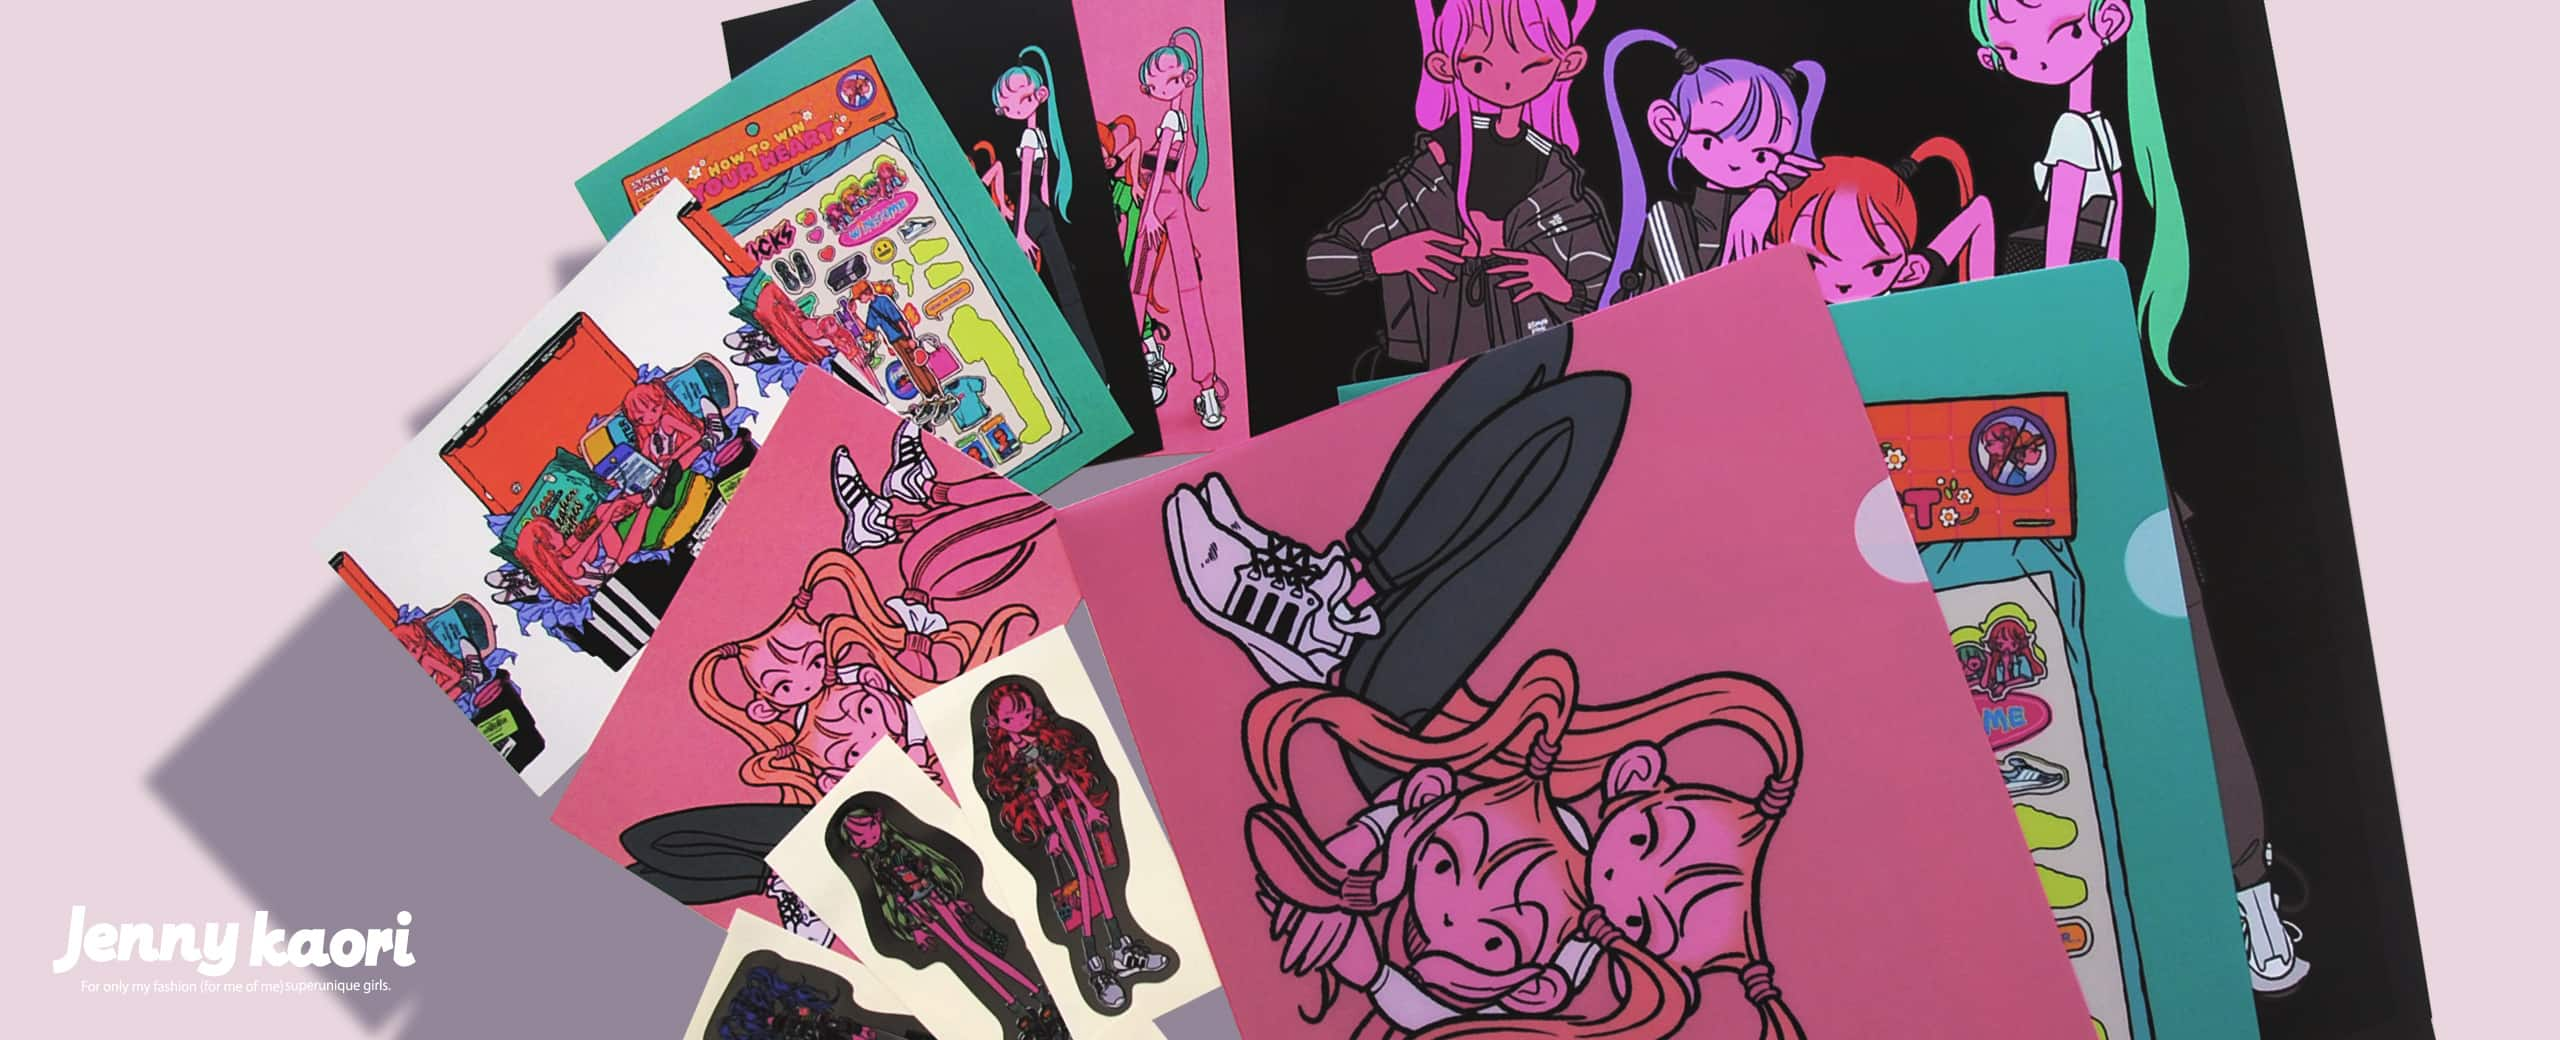 JENNY KAORI × atmos pink